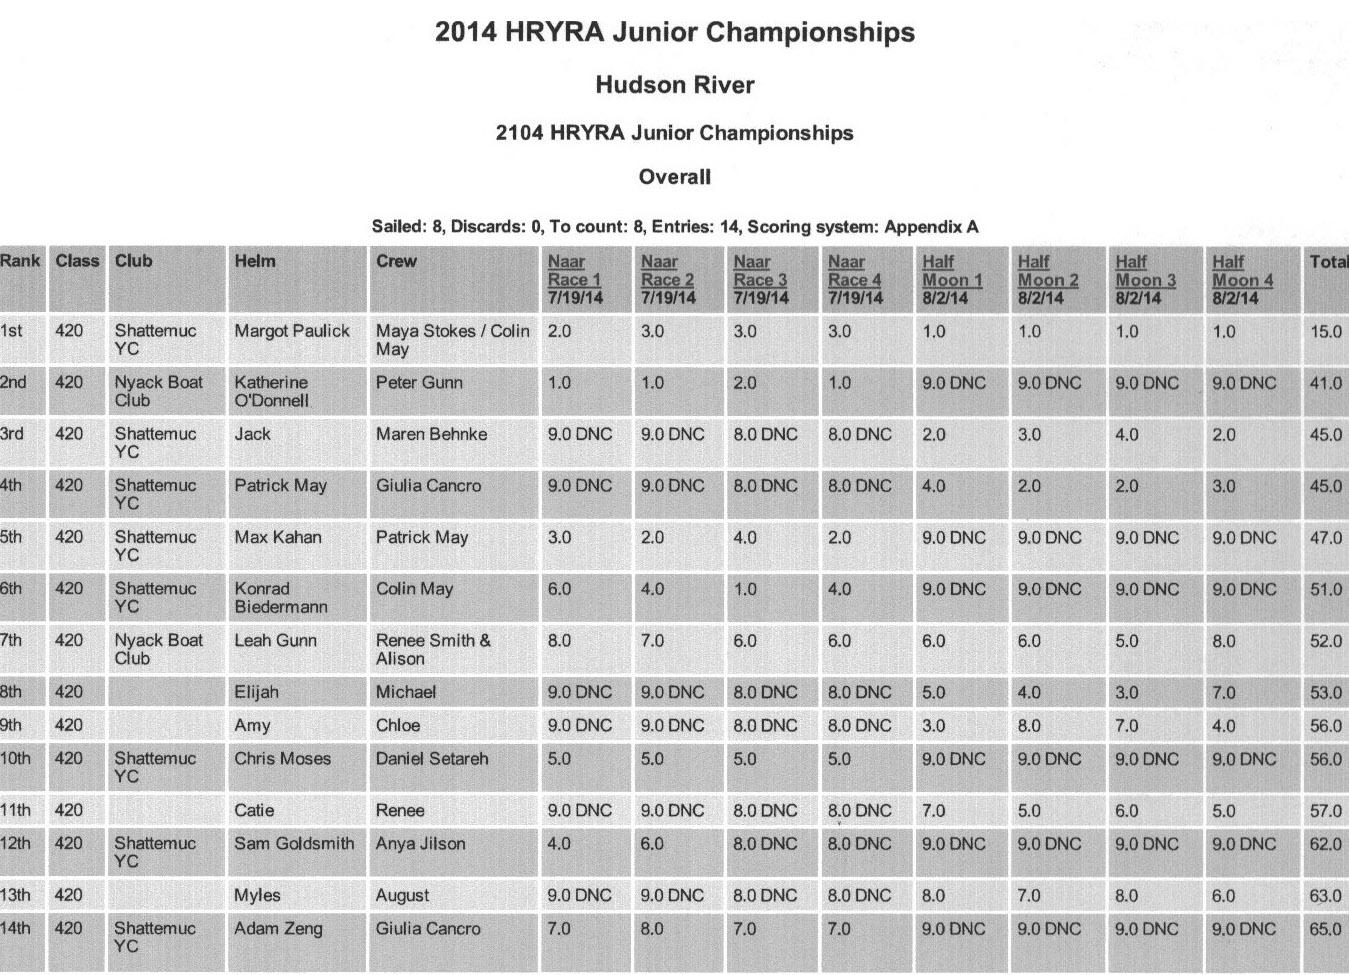 2014 HRYRA Juniors Overall